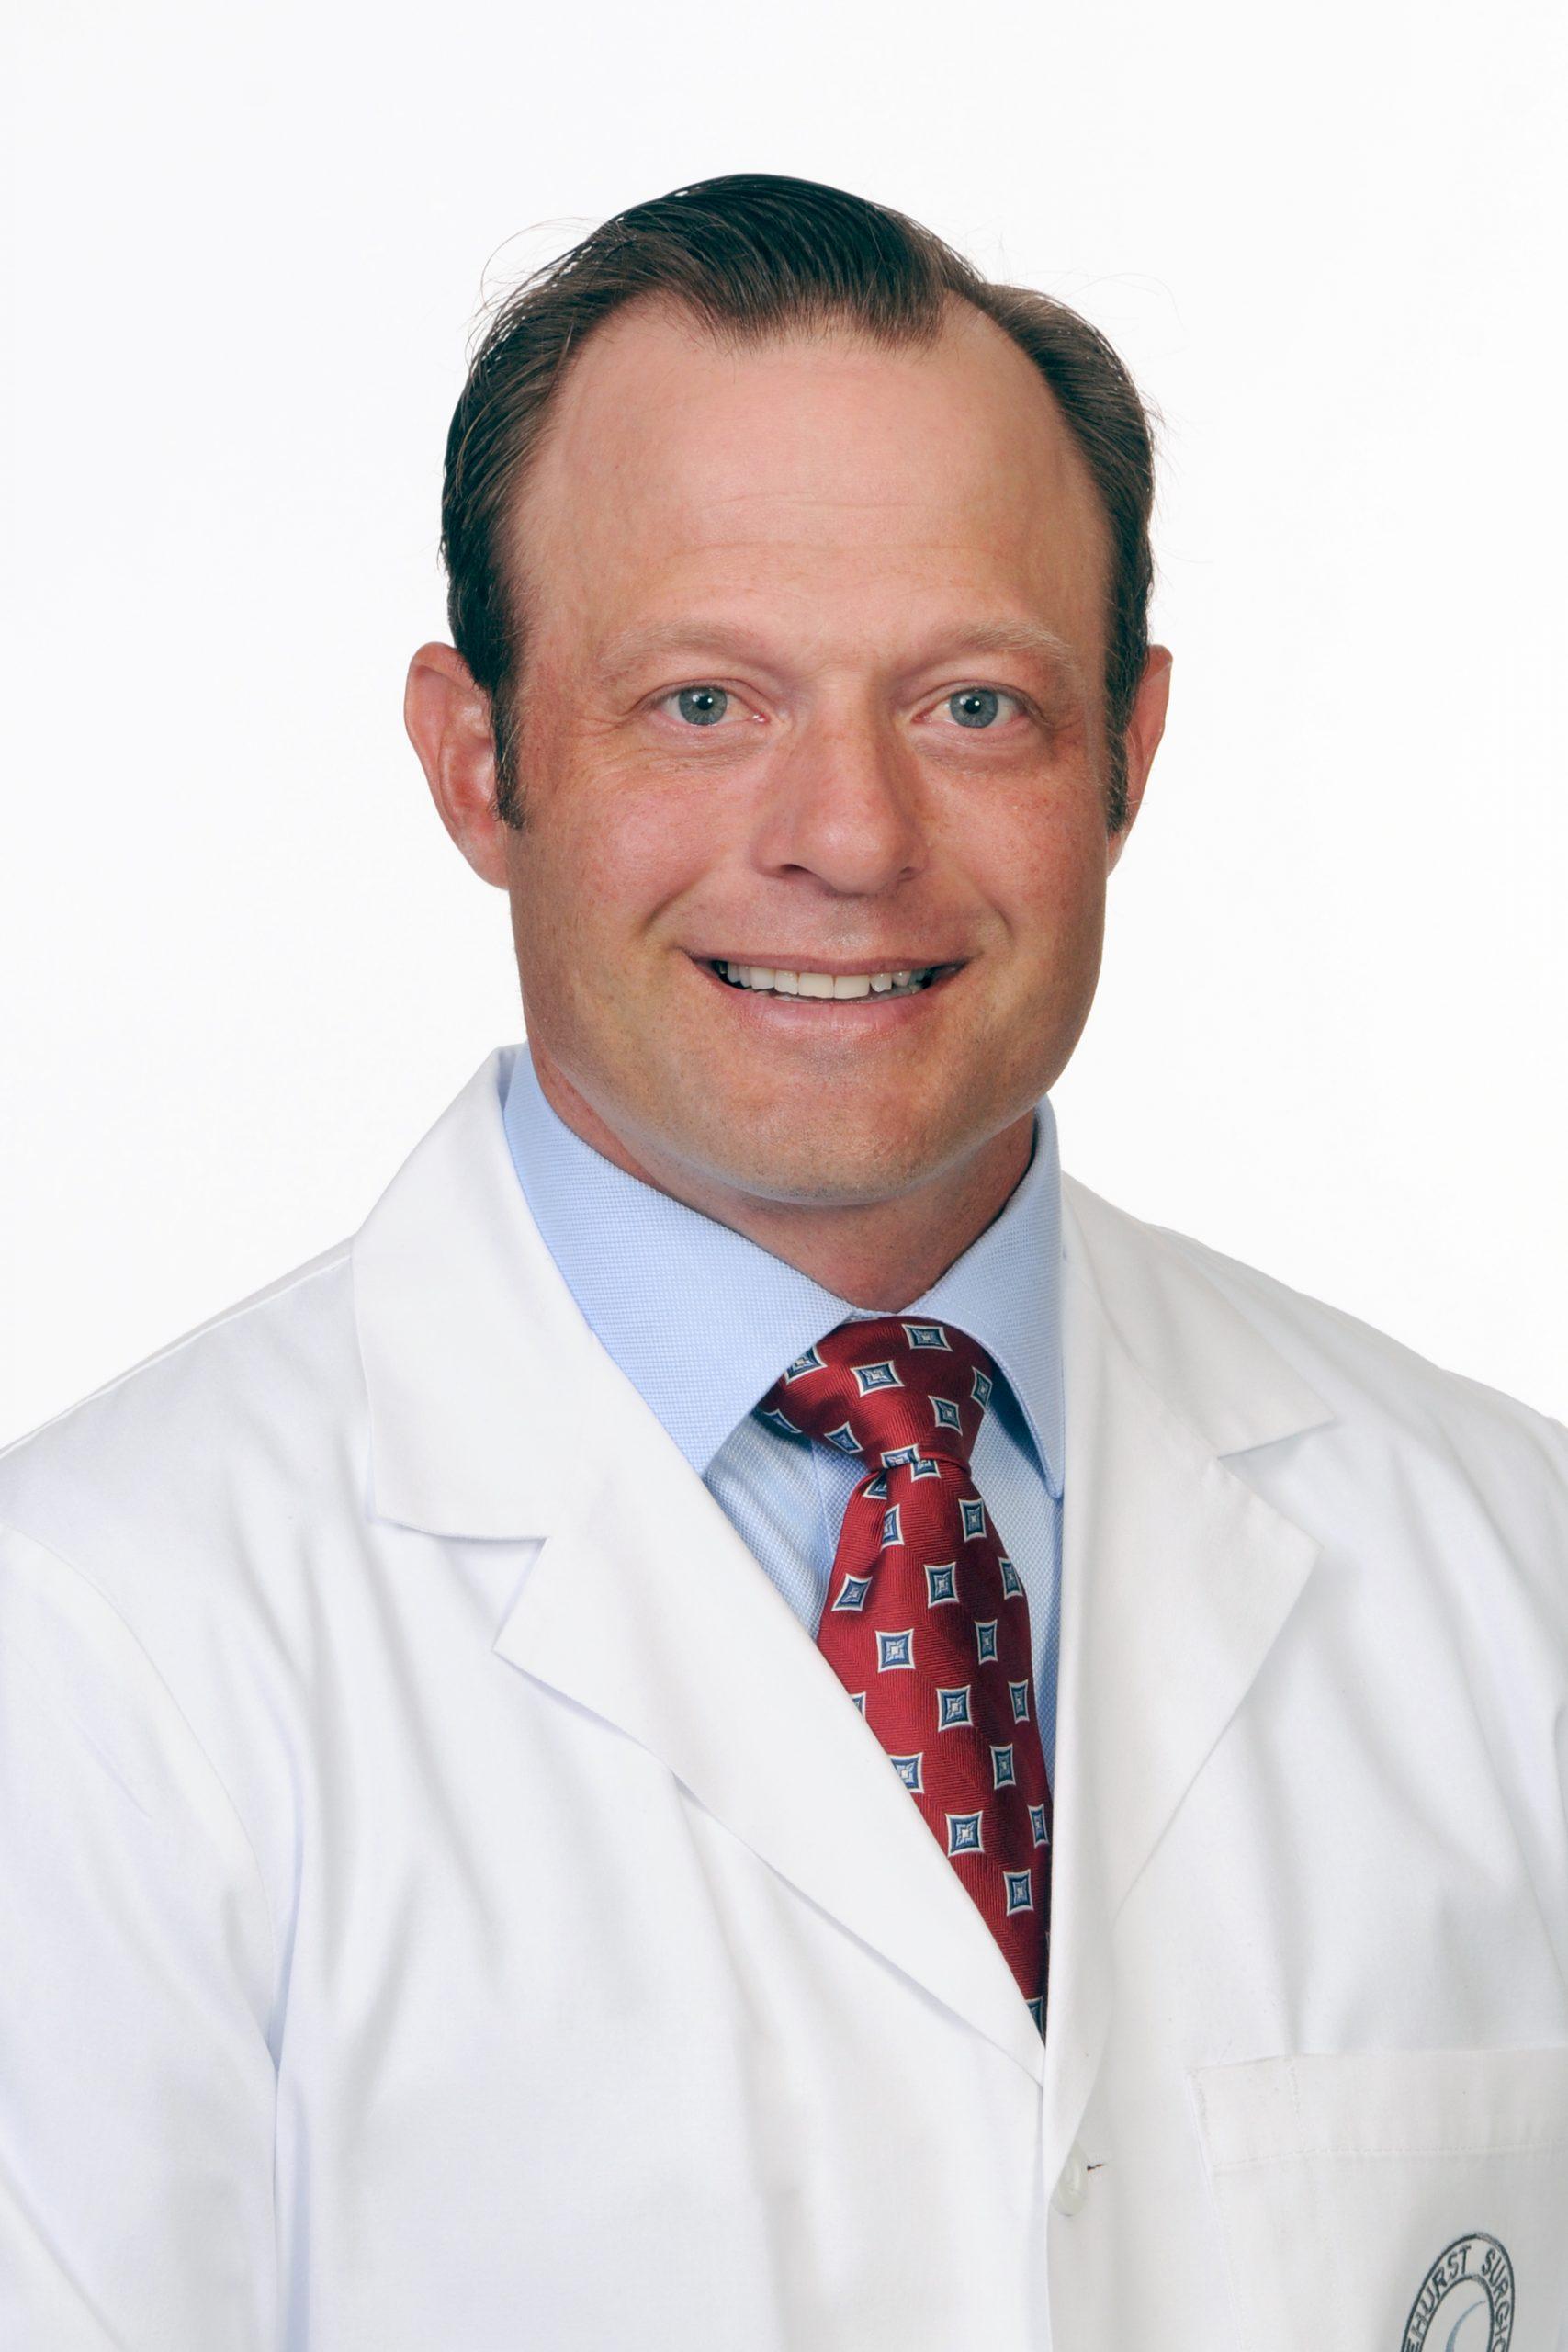 David Catron Orthopaedic Surgery